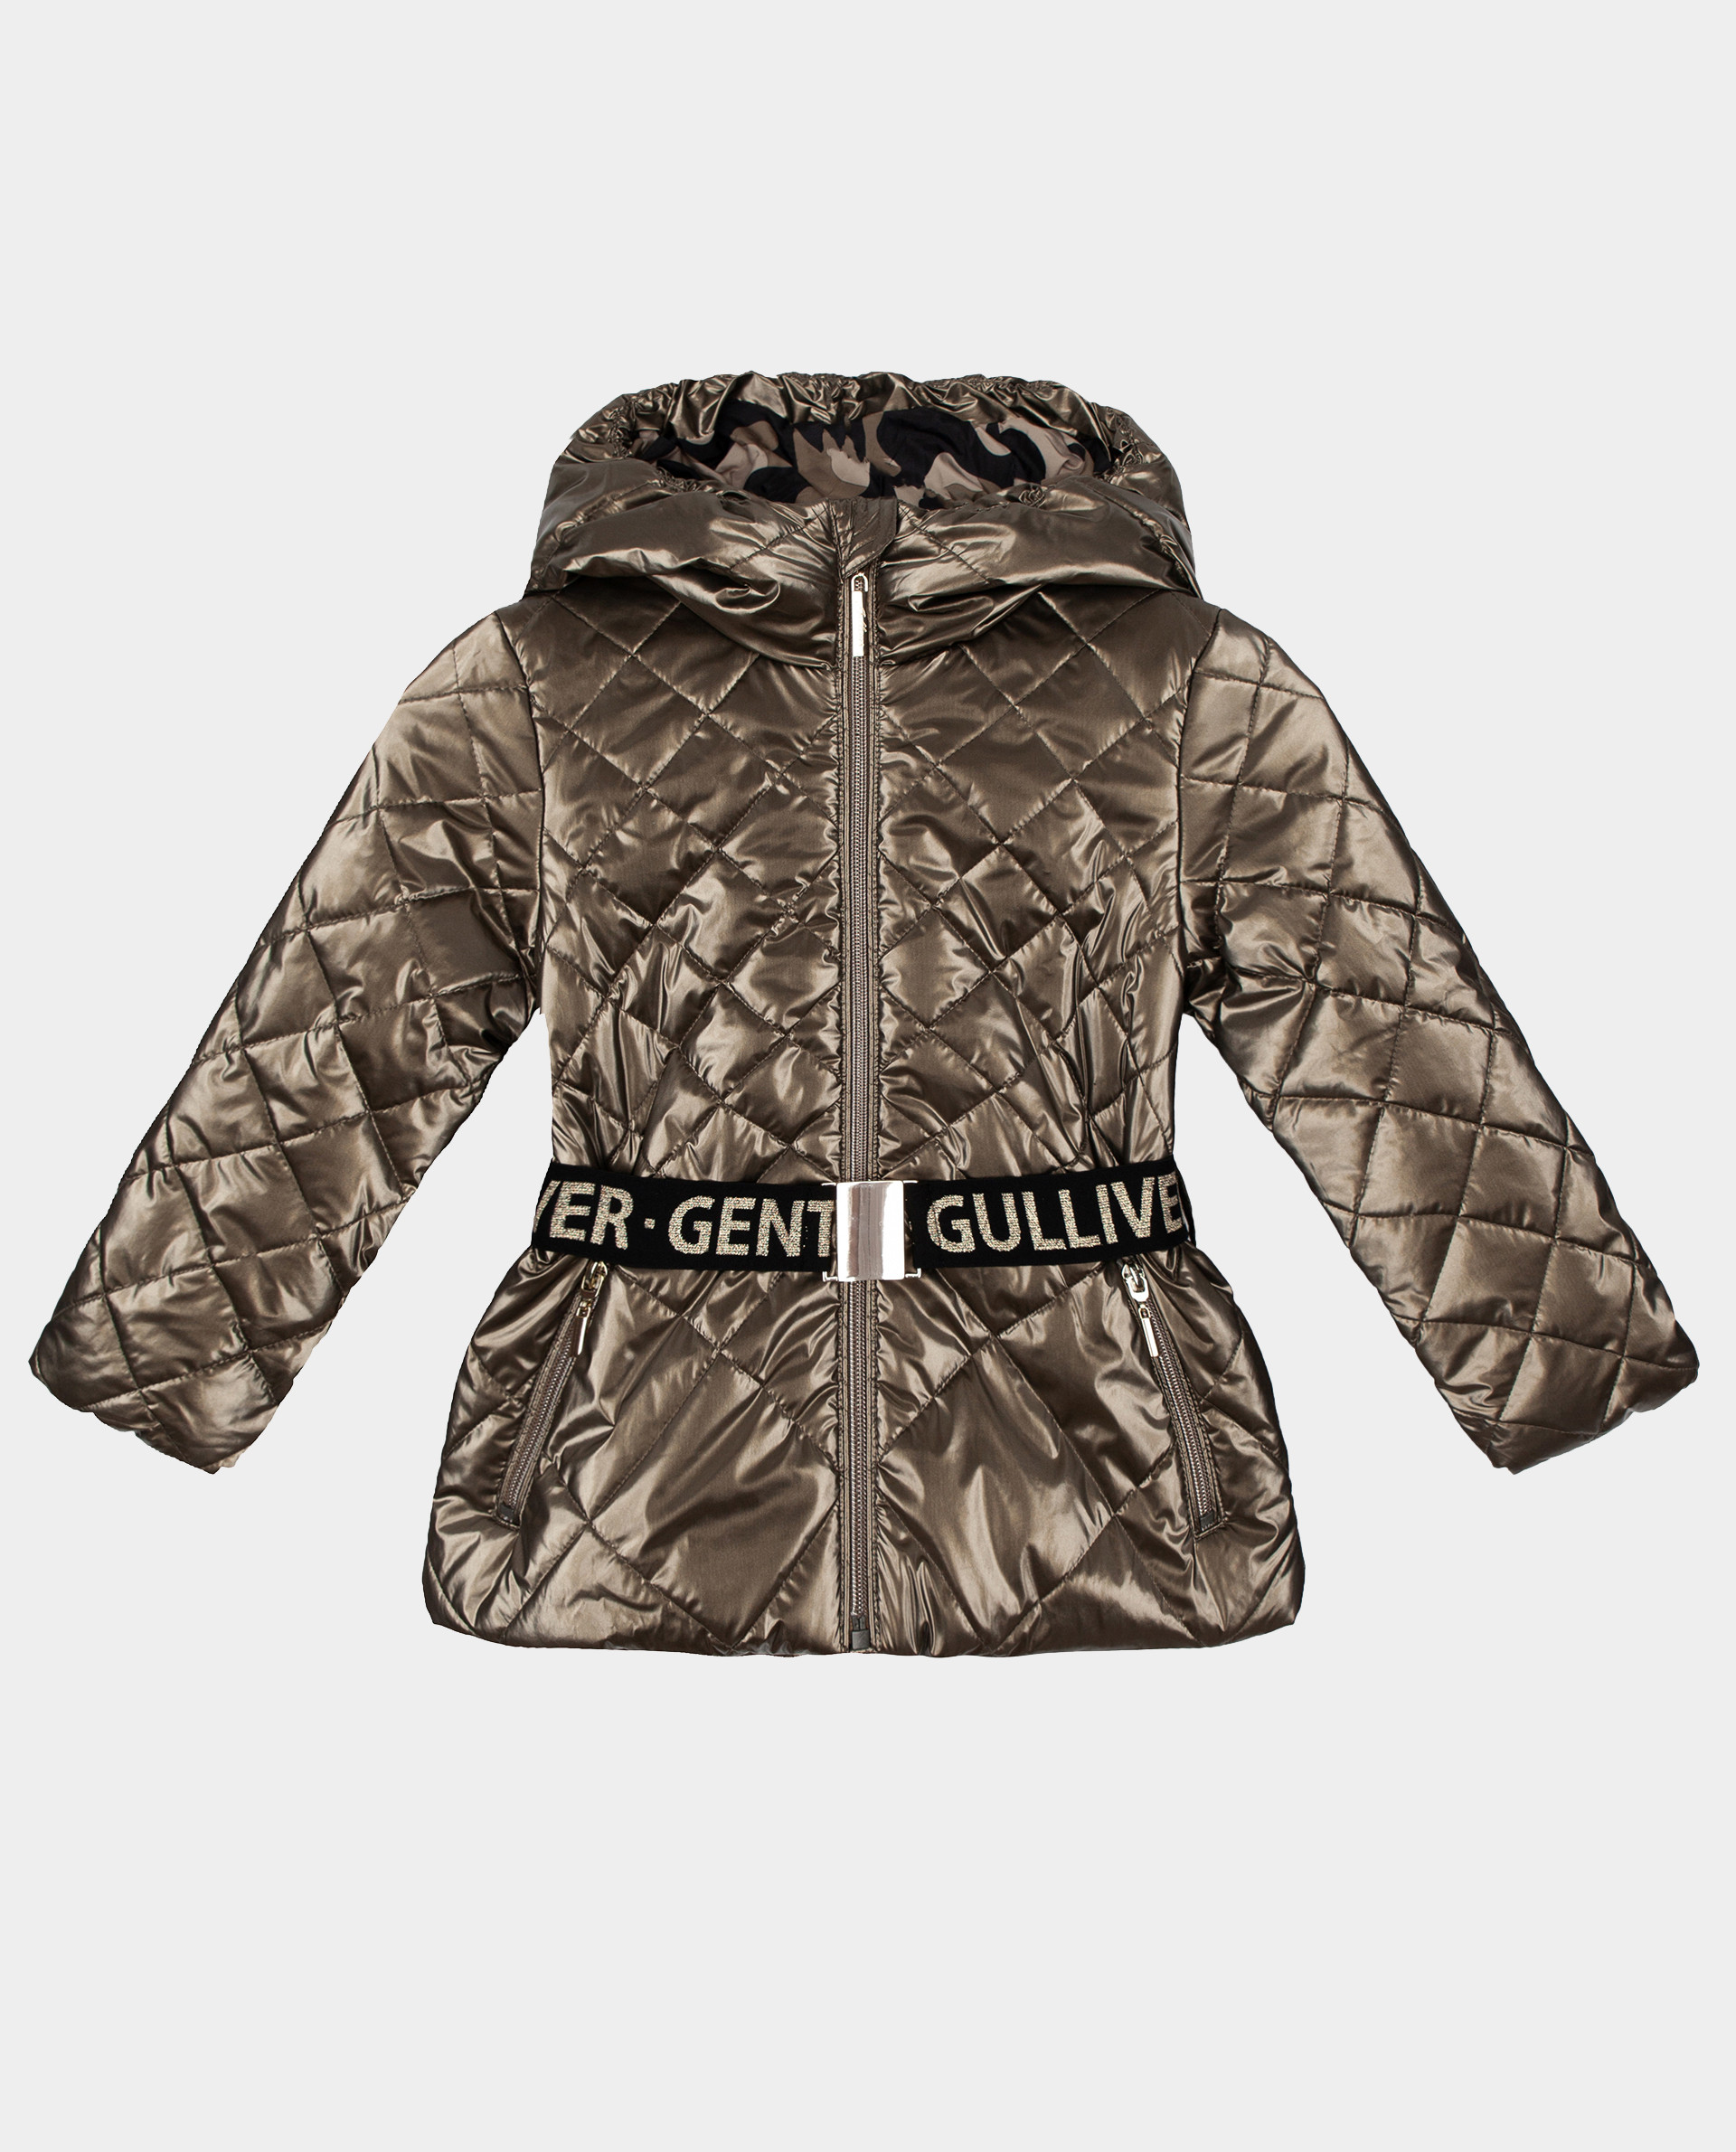 Бронзовая куртка демисезонная Gulliver размер 98 22001GMC4104